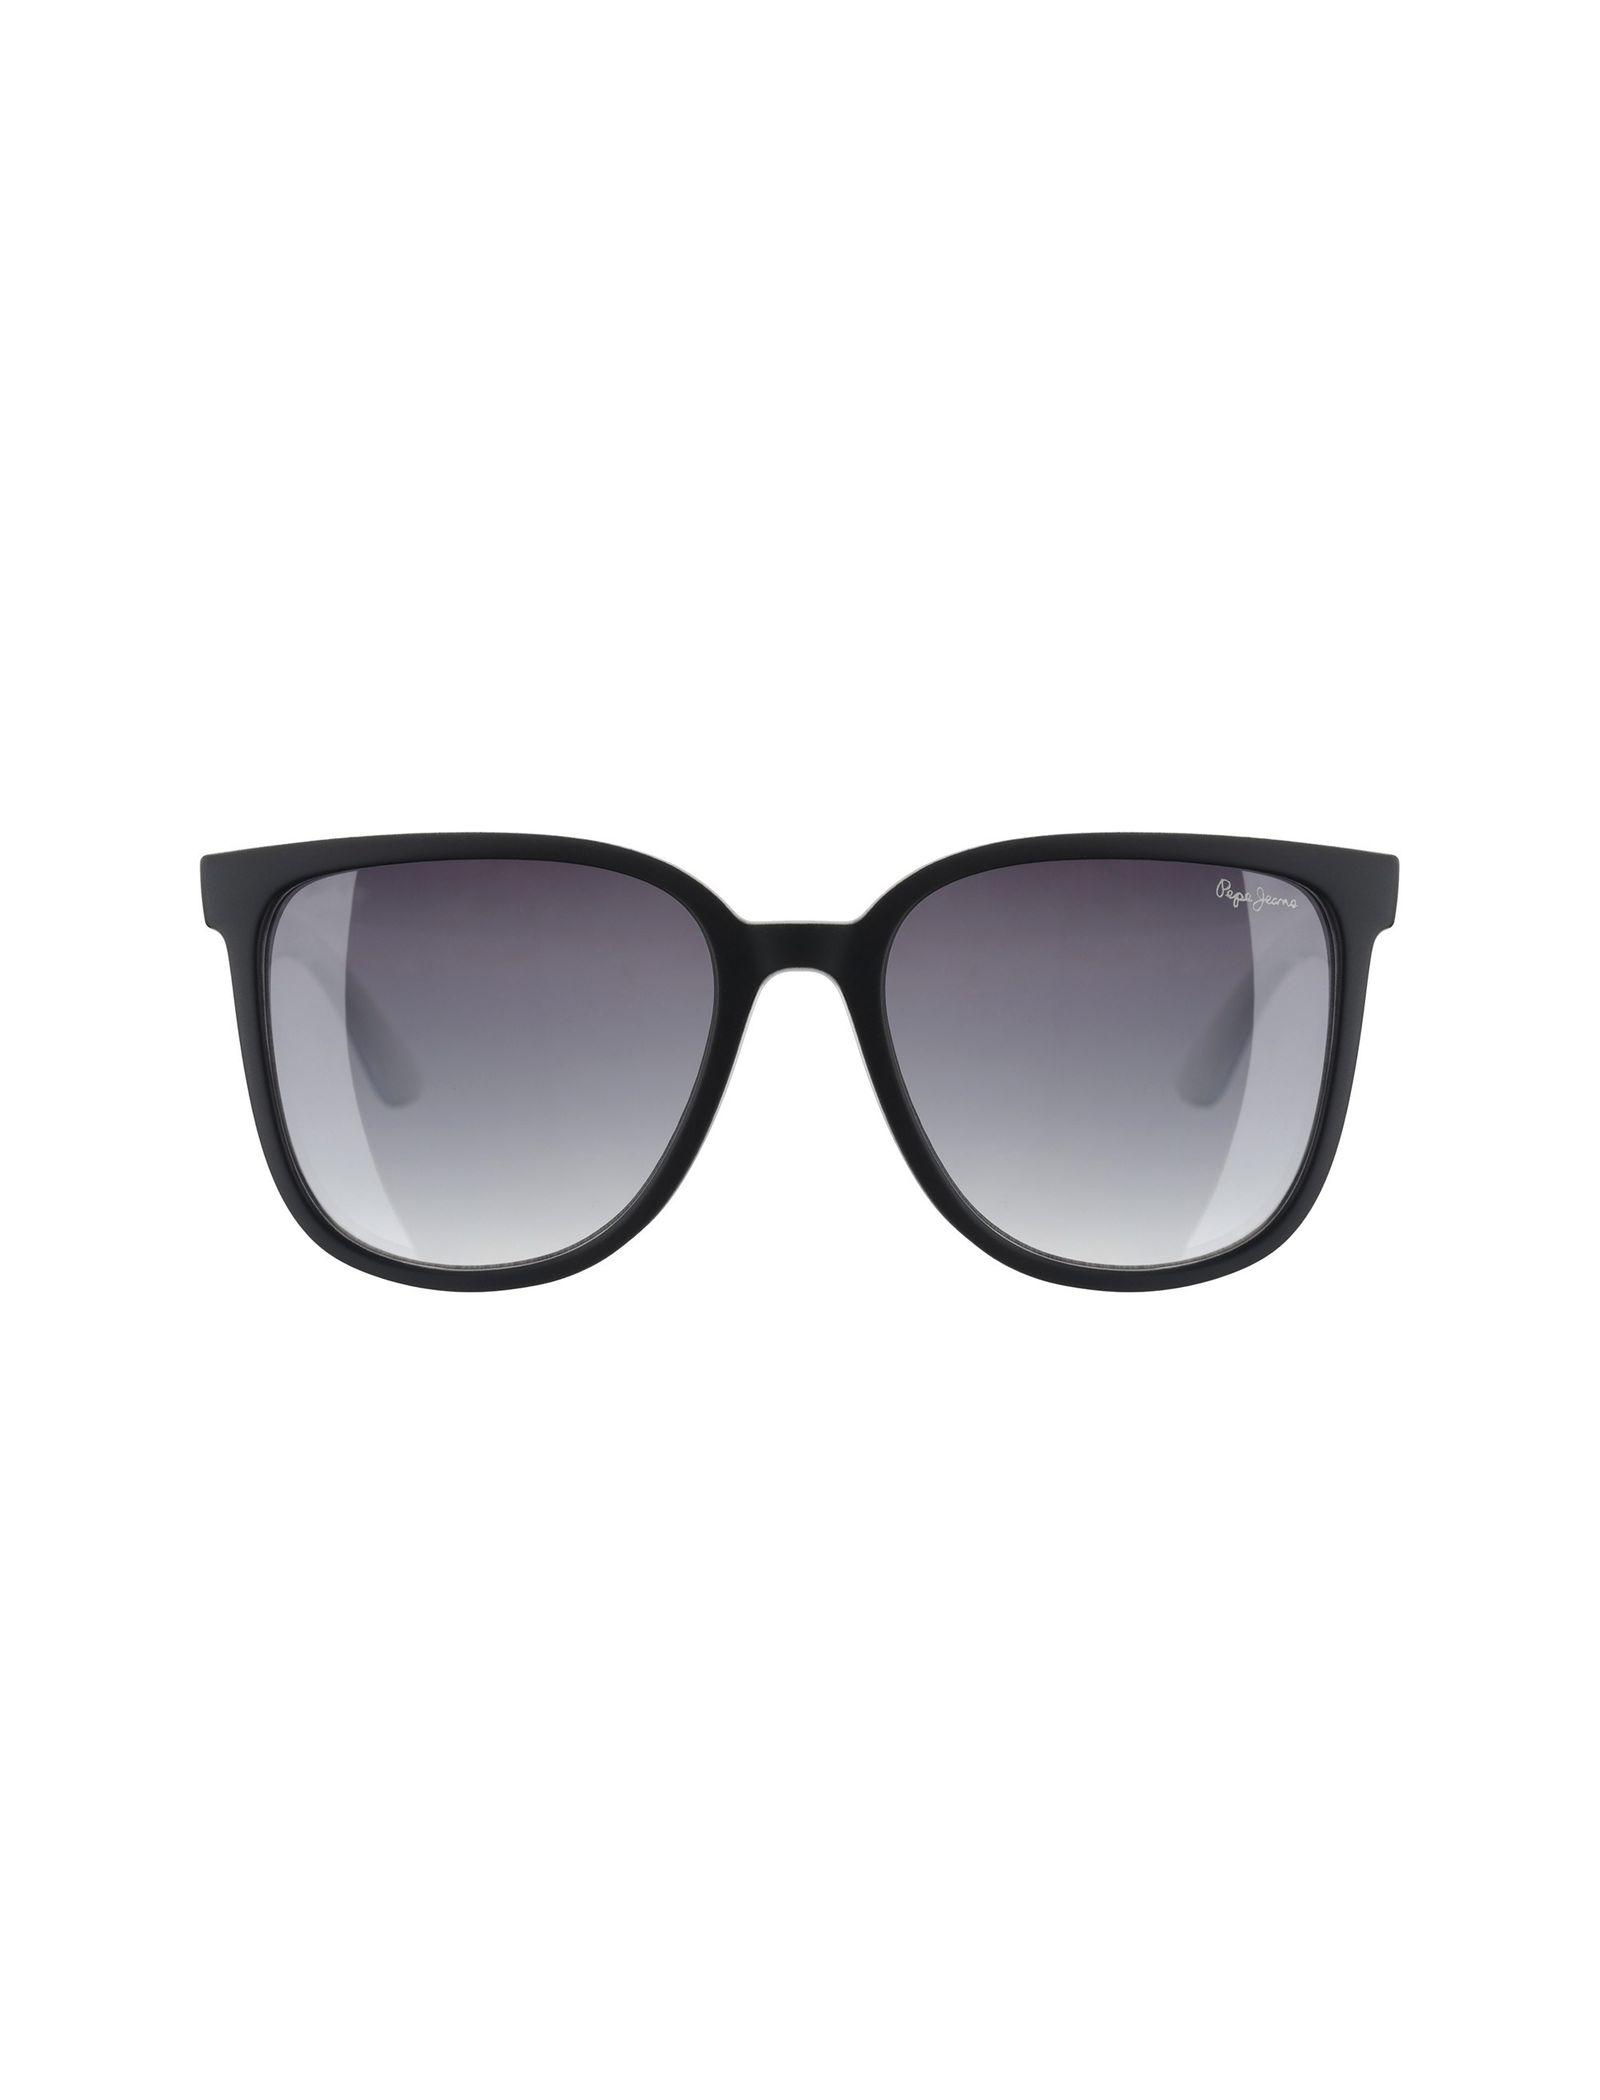 عینک آفتابی ویفرر زنانه - پپه جینز - مشکي - 1